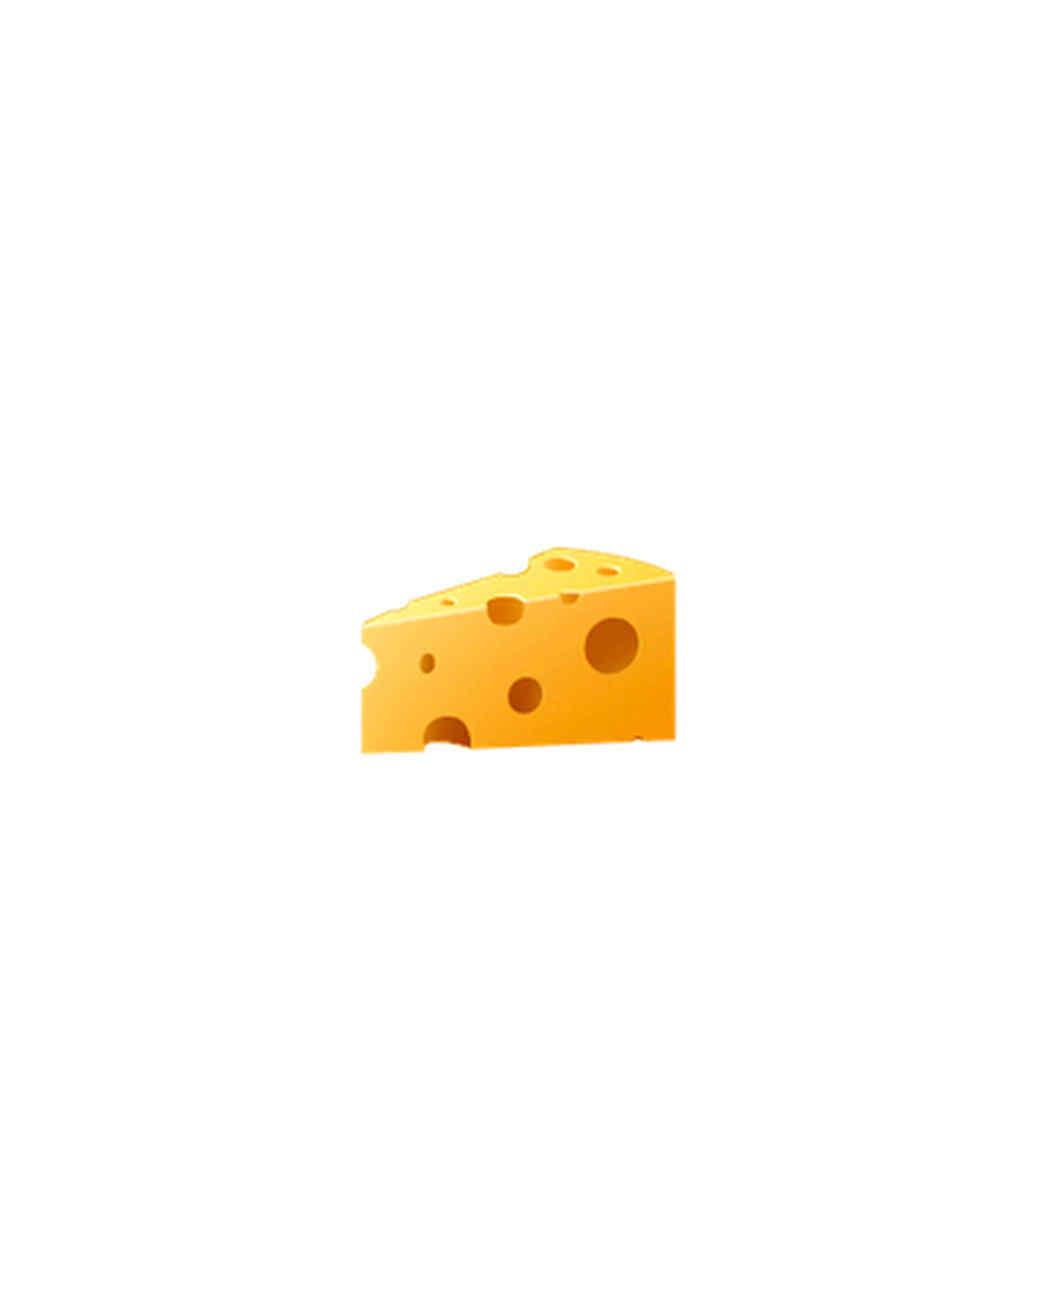 emoji-cheese-1015.jpg